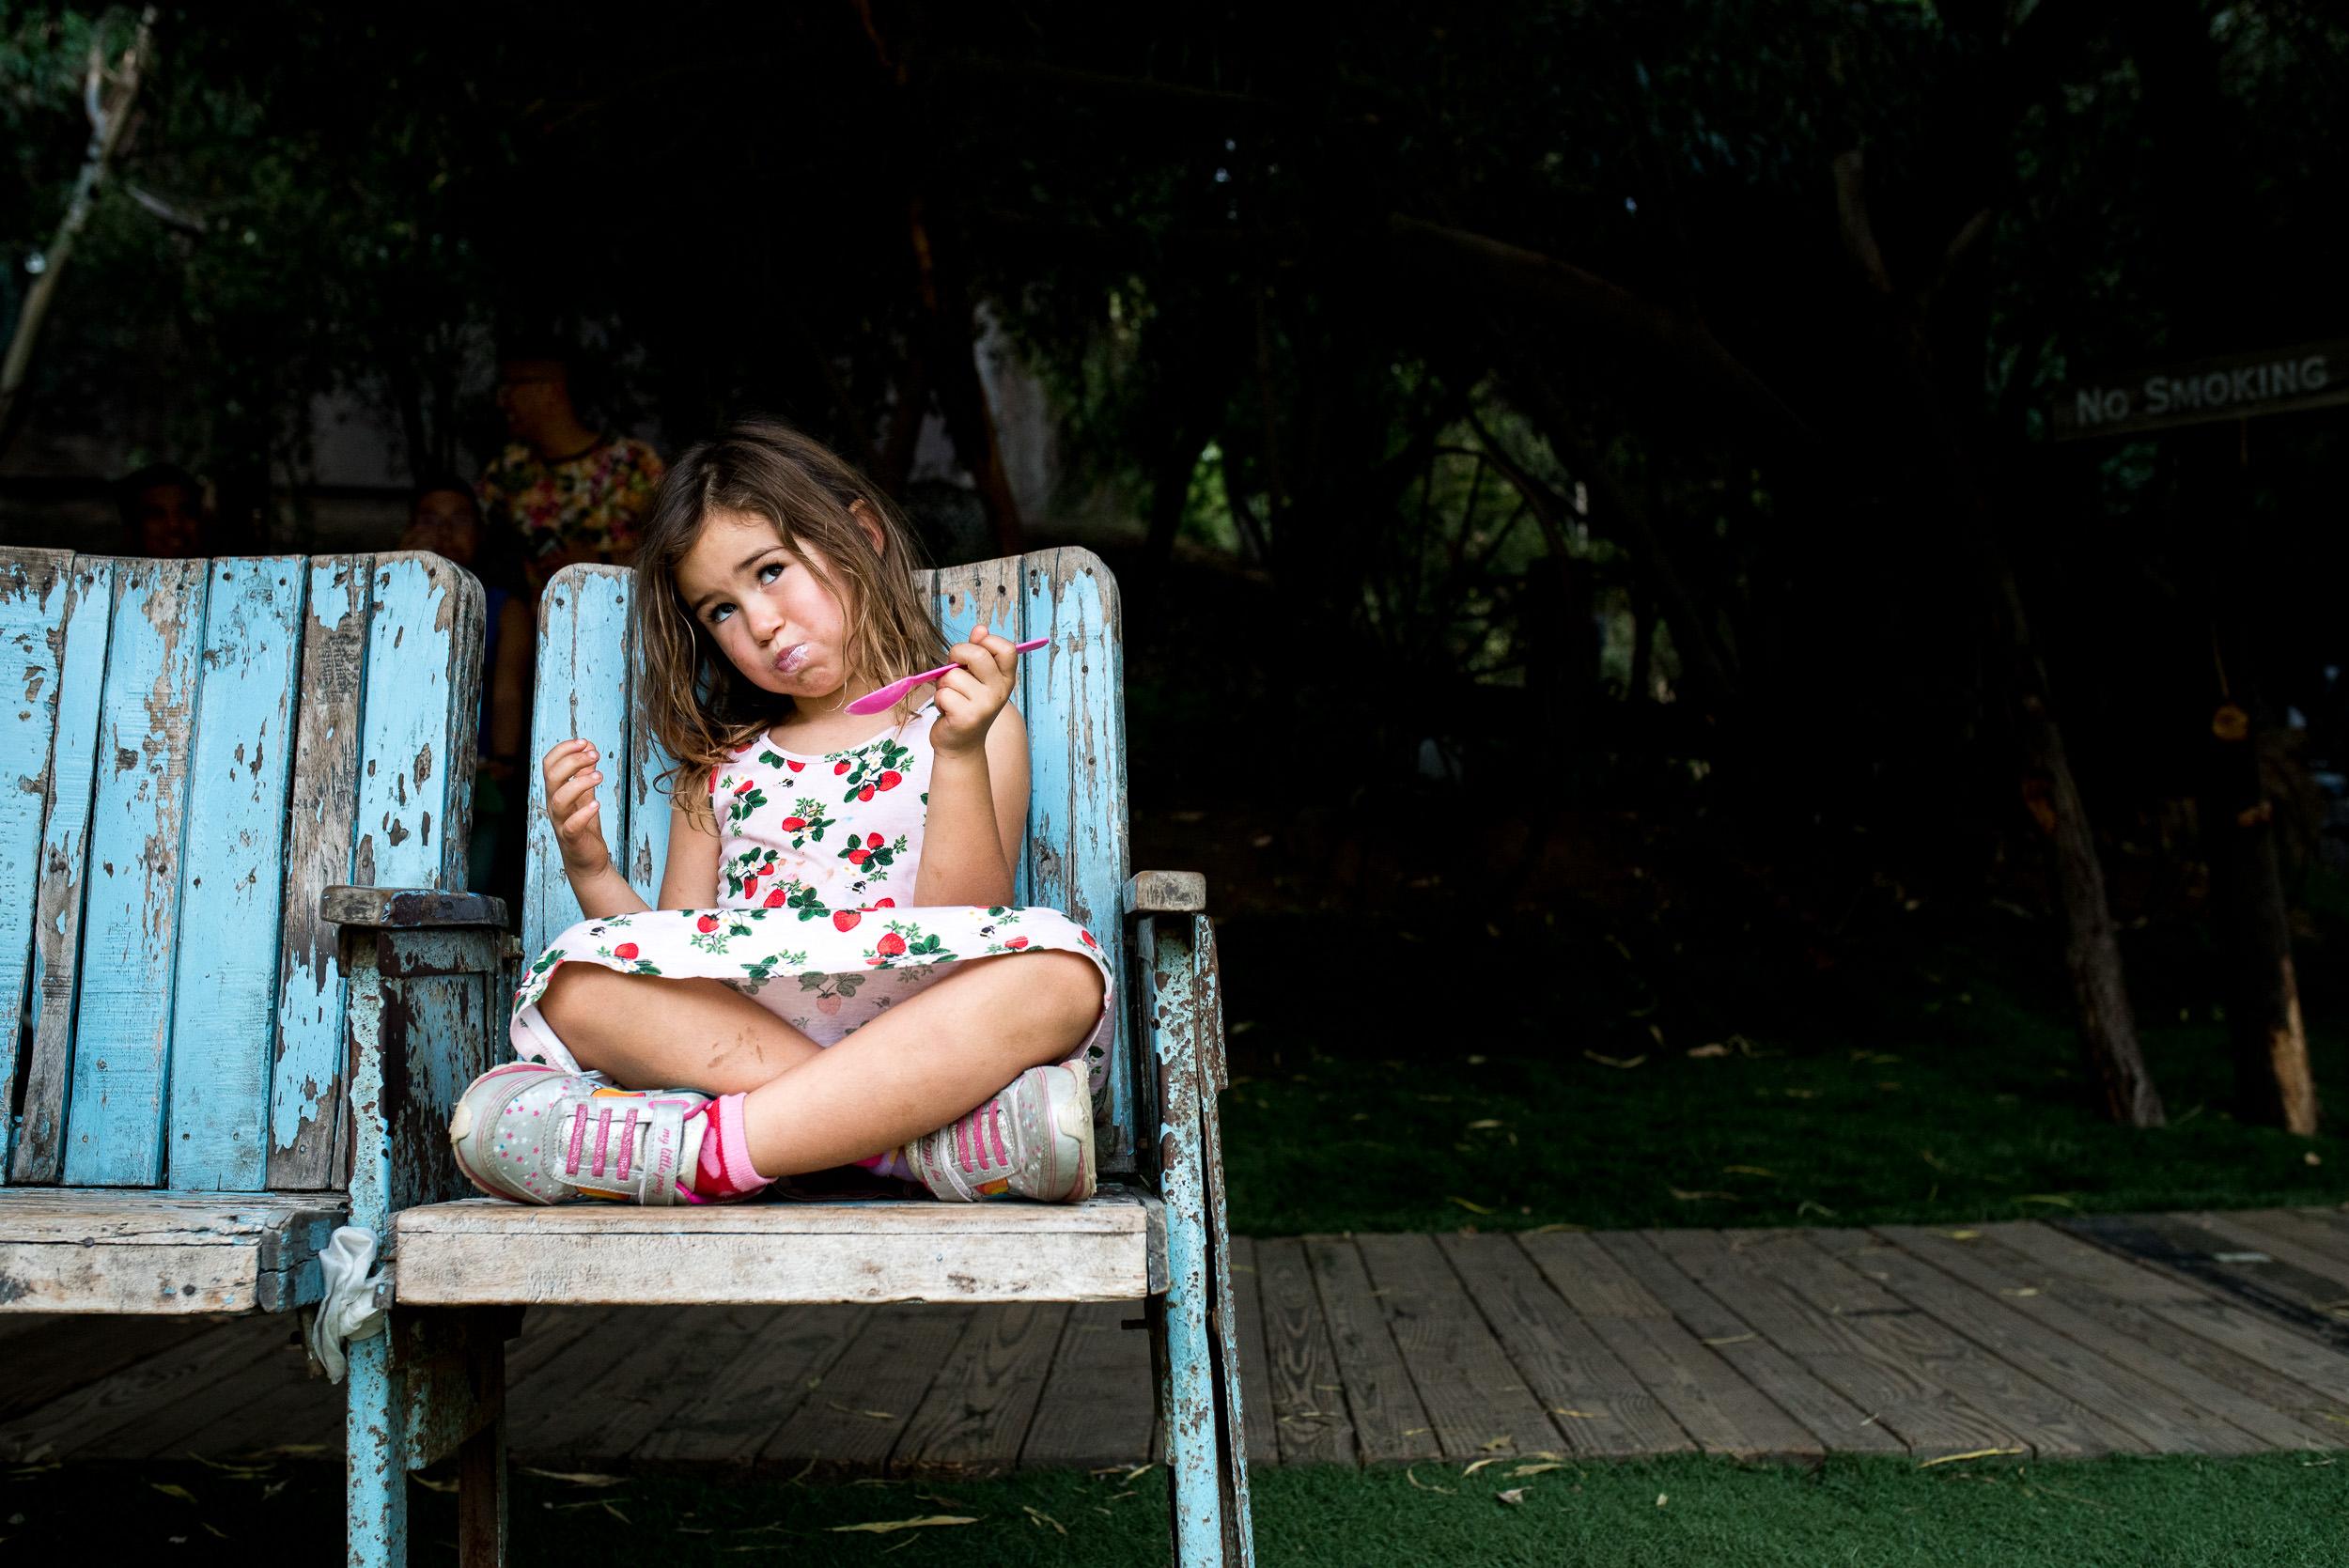 Deborah-Barak-Documentary-Family-Photography-Brooklyn_NYC_girl-eats-icecream.jpg